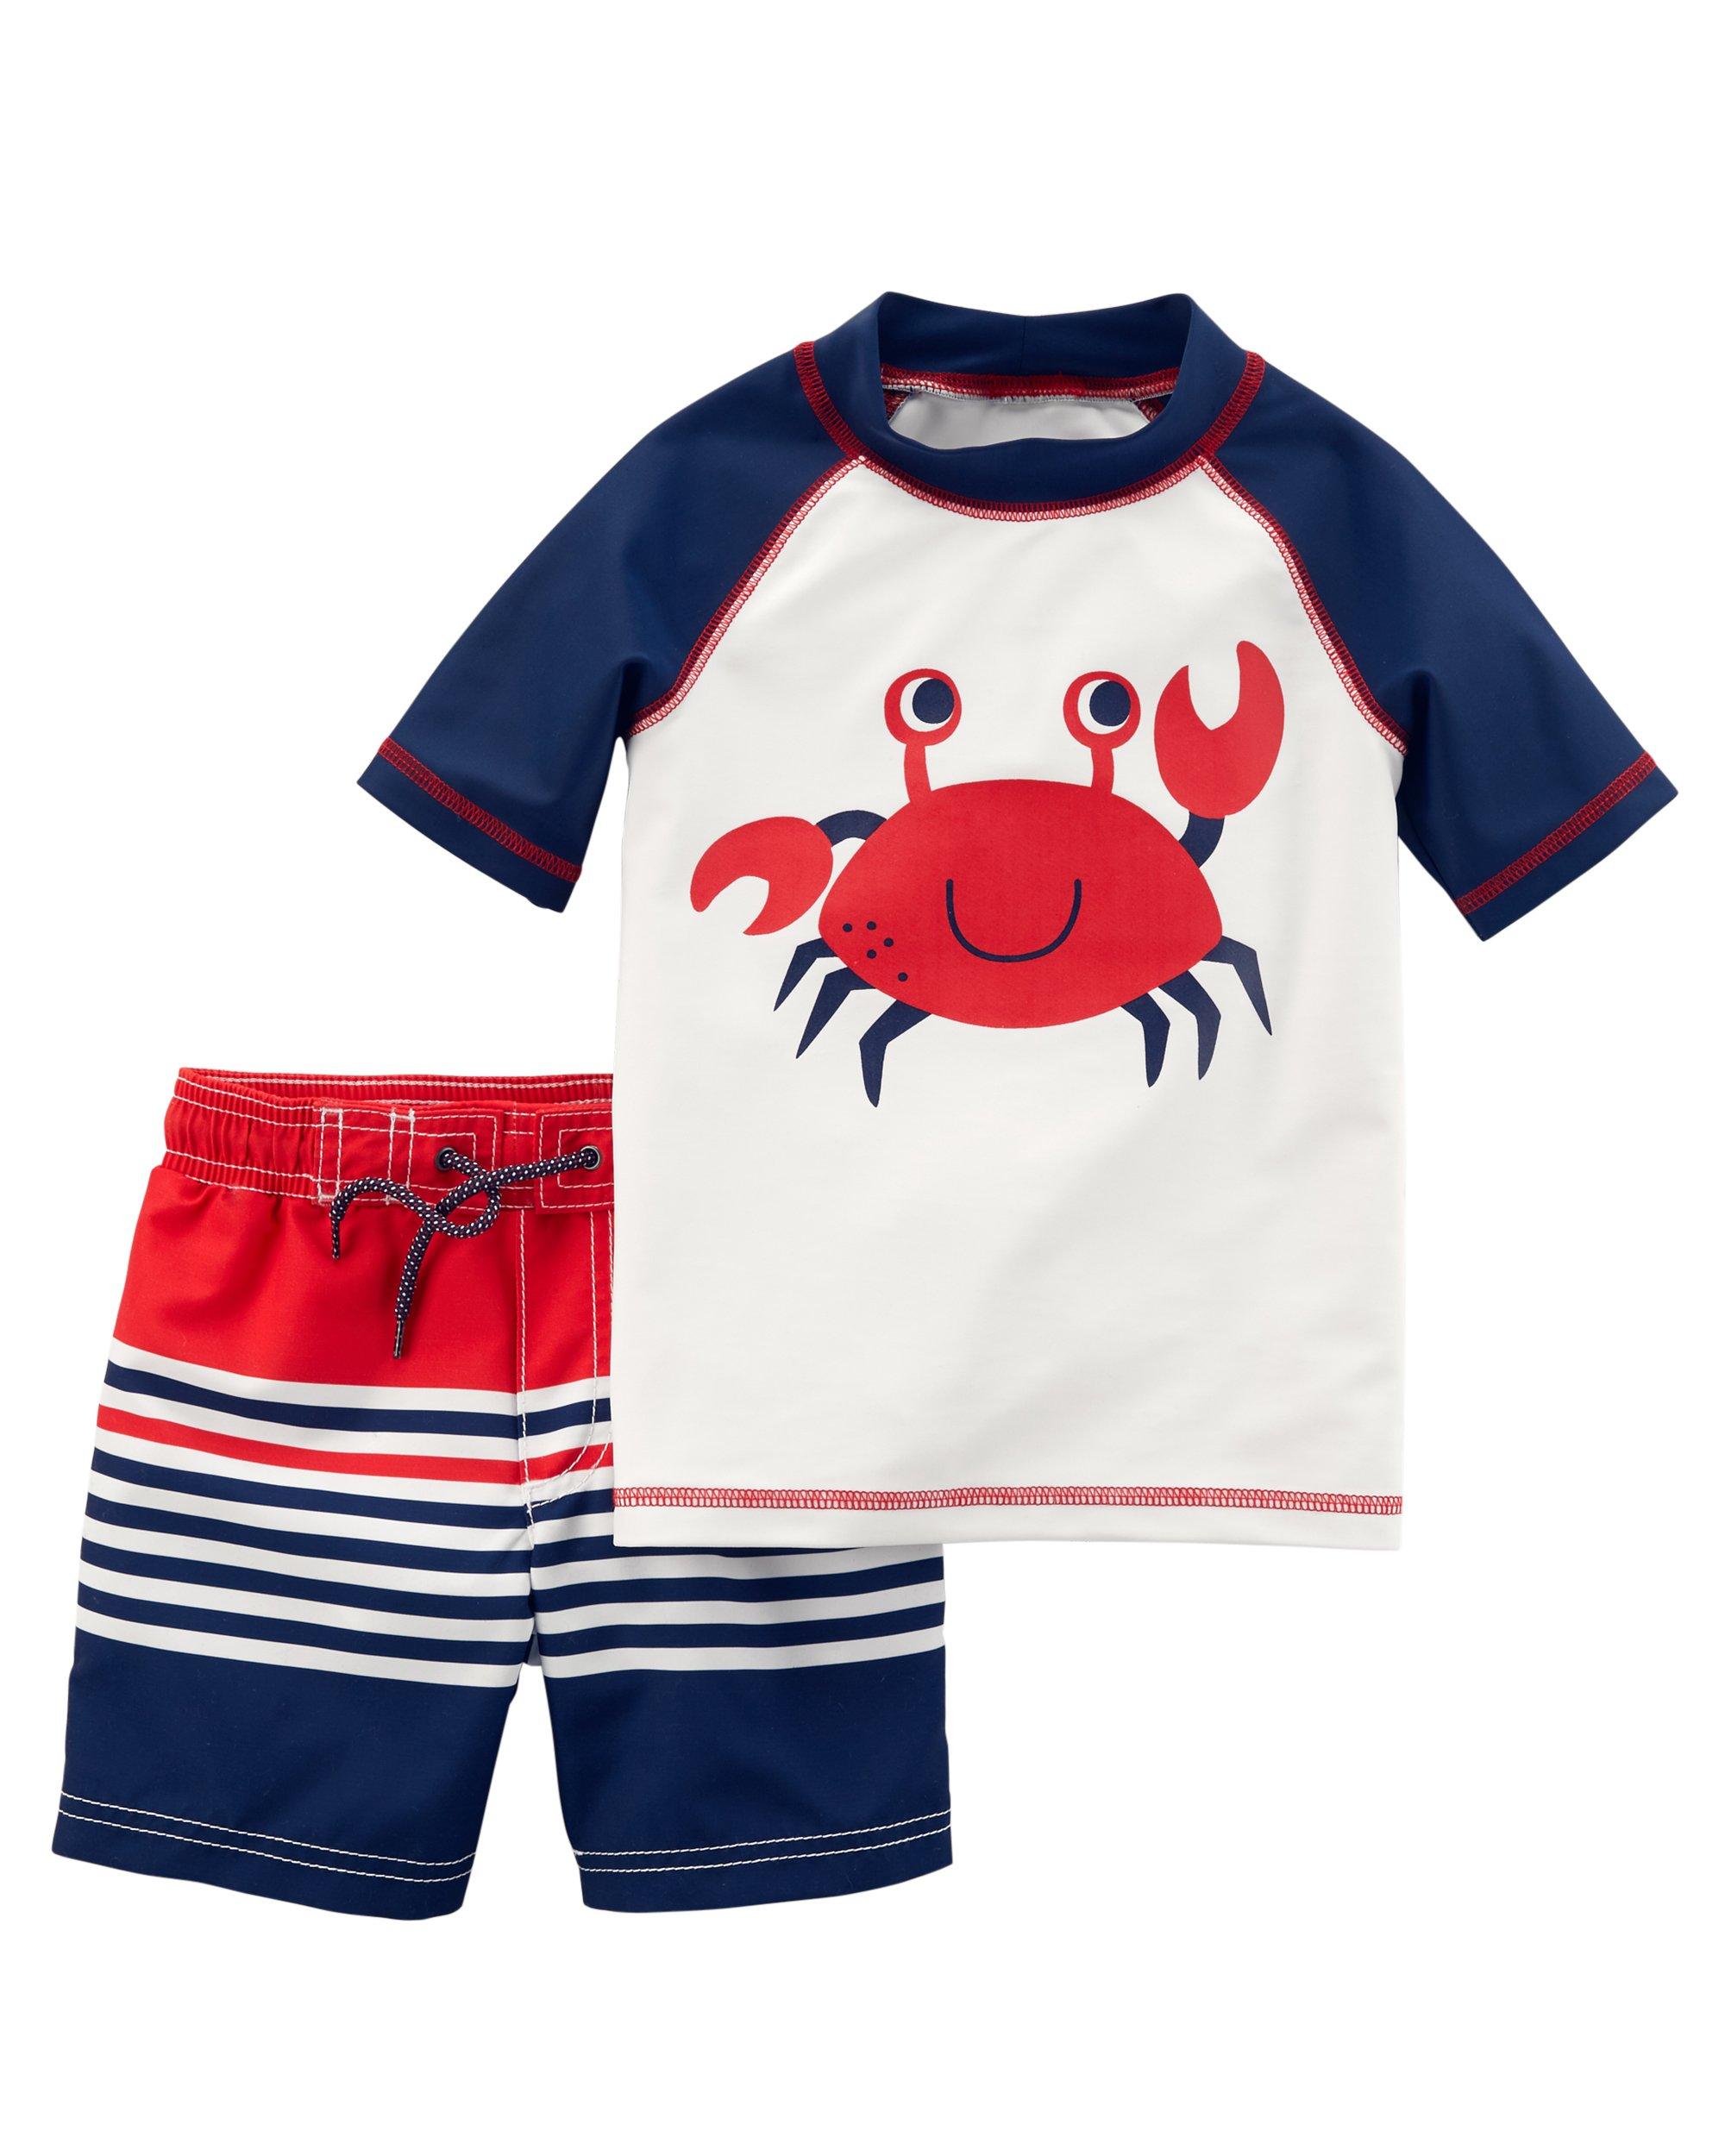 Carter's Boys' Toddler Rashguard Swim Set, Navy